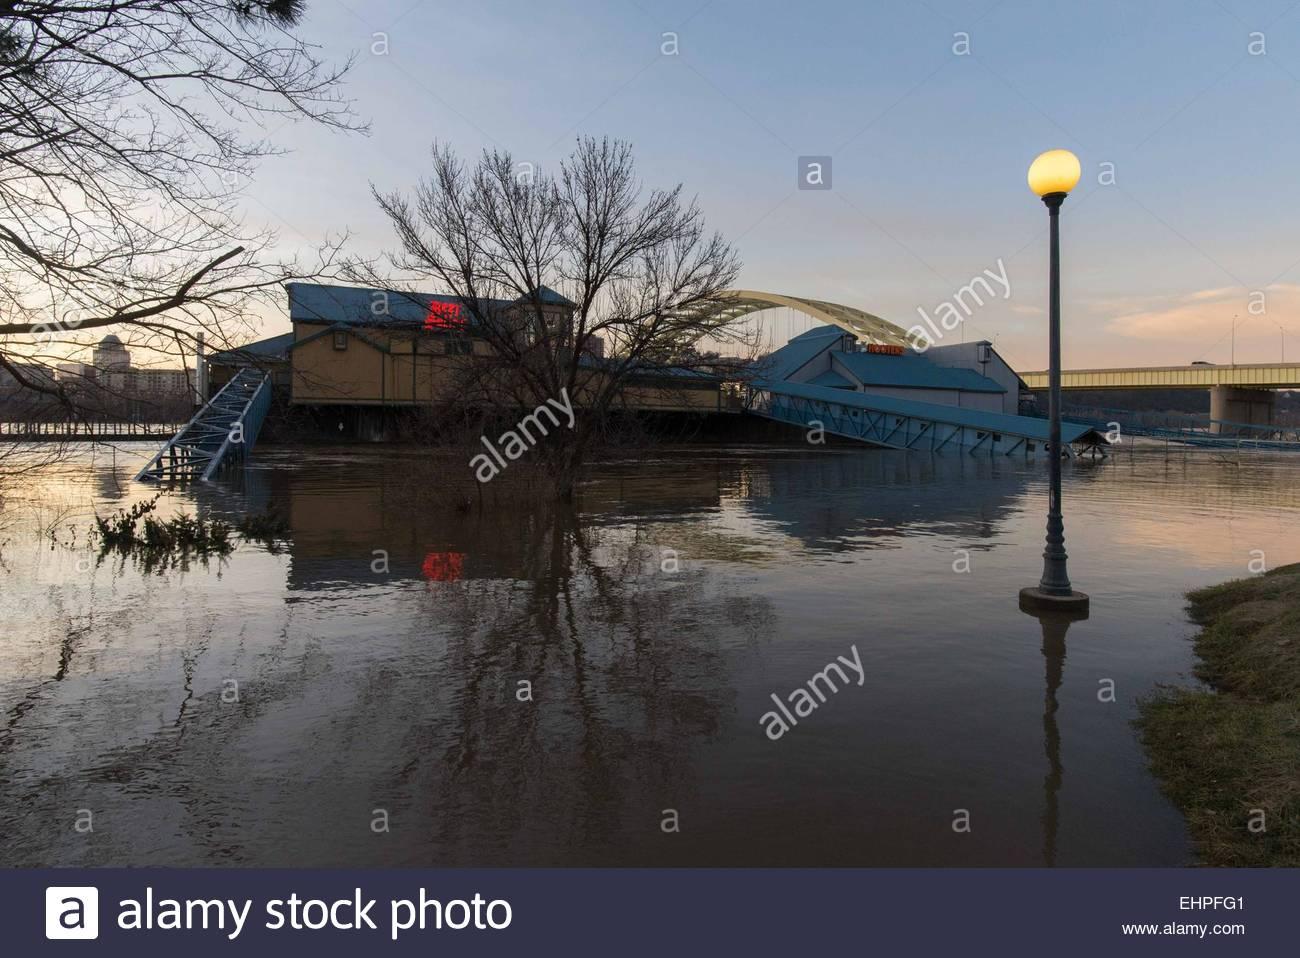 Cincinnati Ohio Usa 16th Mar 2015 Floodwaters From The Ohio